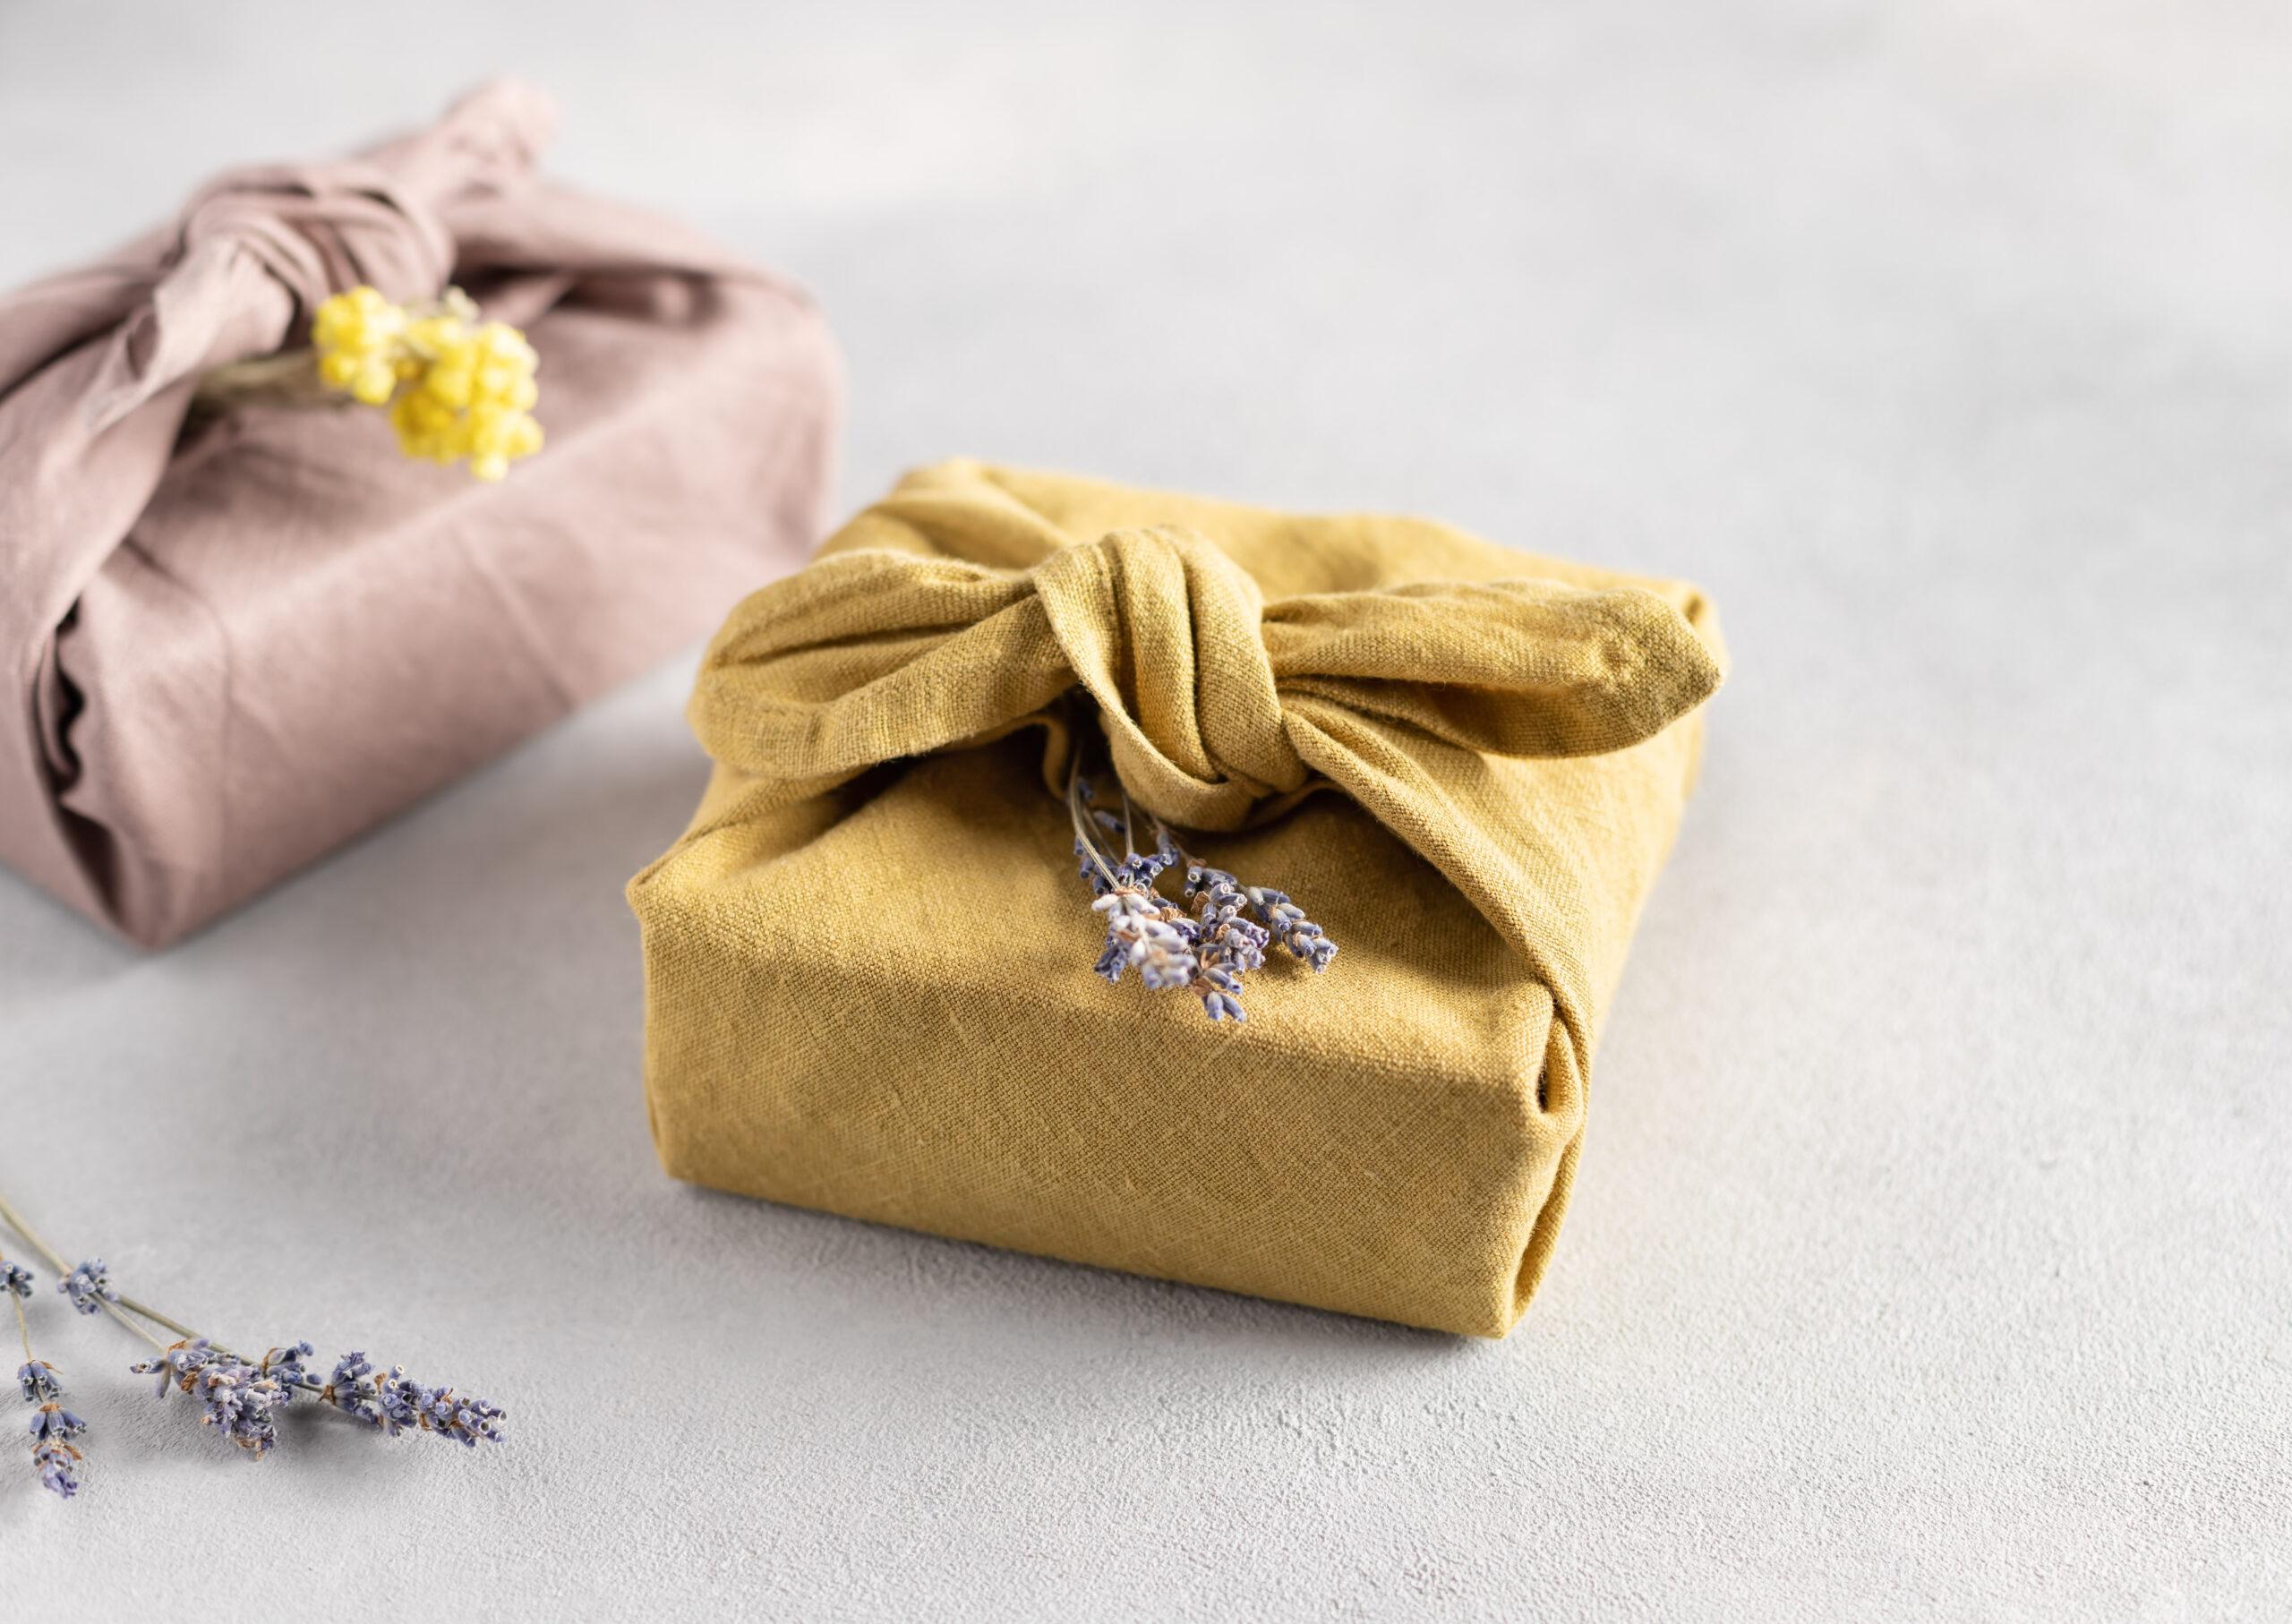 zero dechet emballage cadeau reutilisable joliboaz